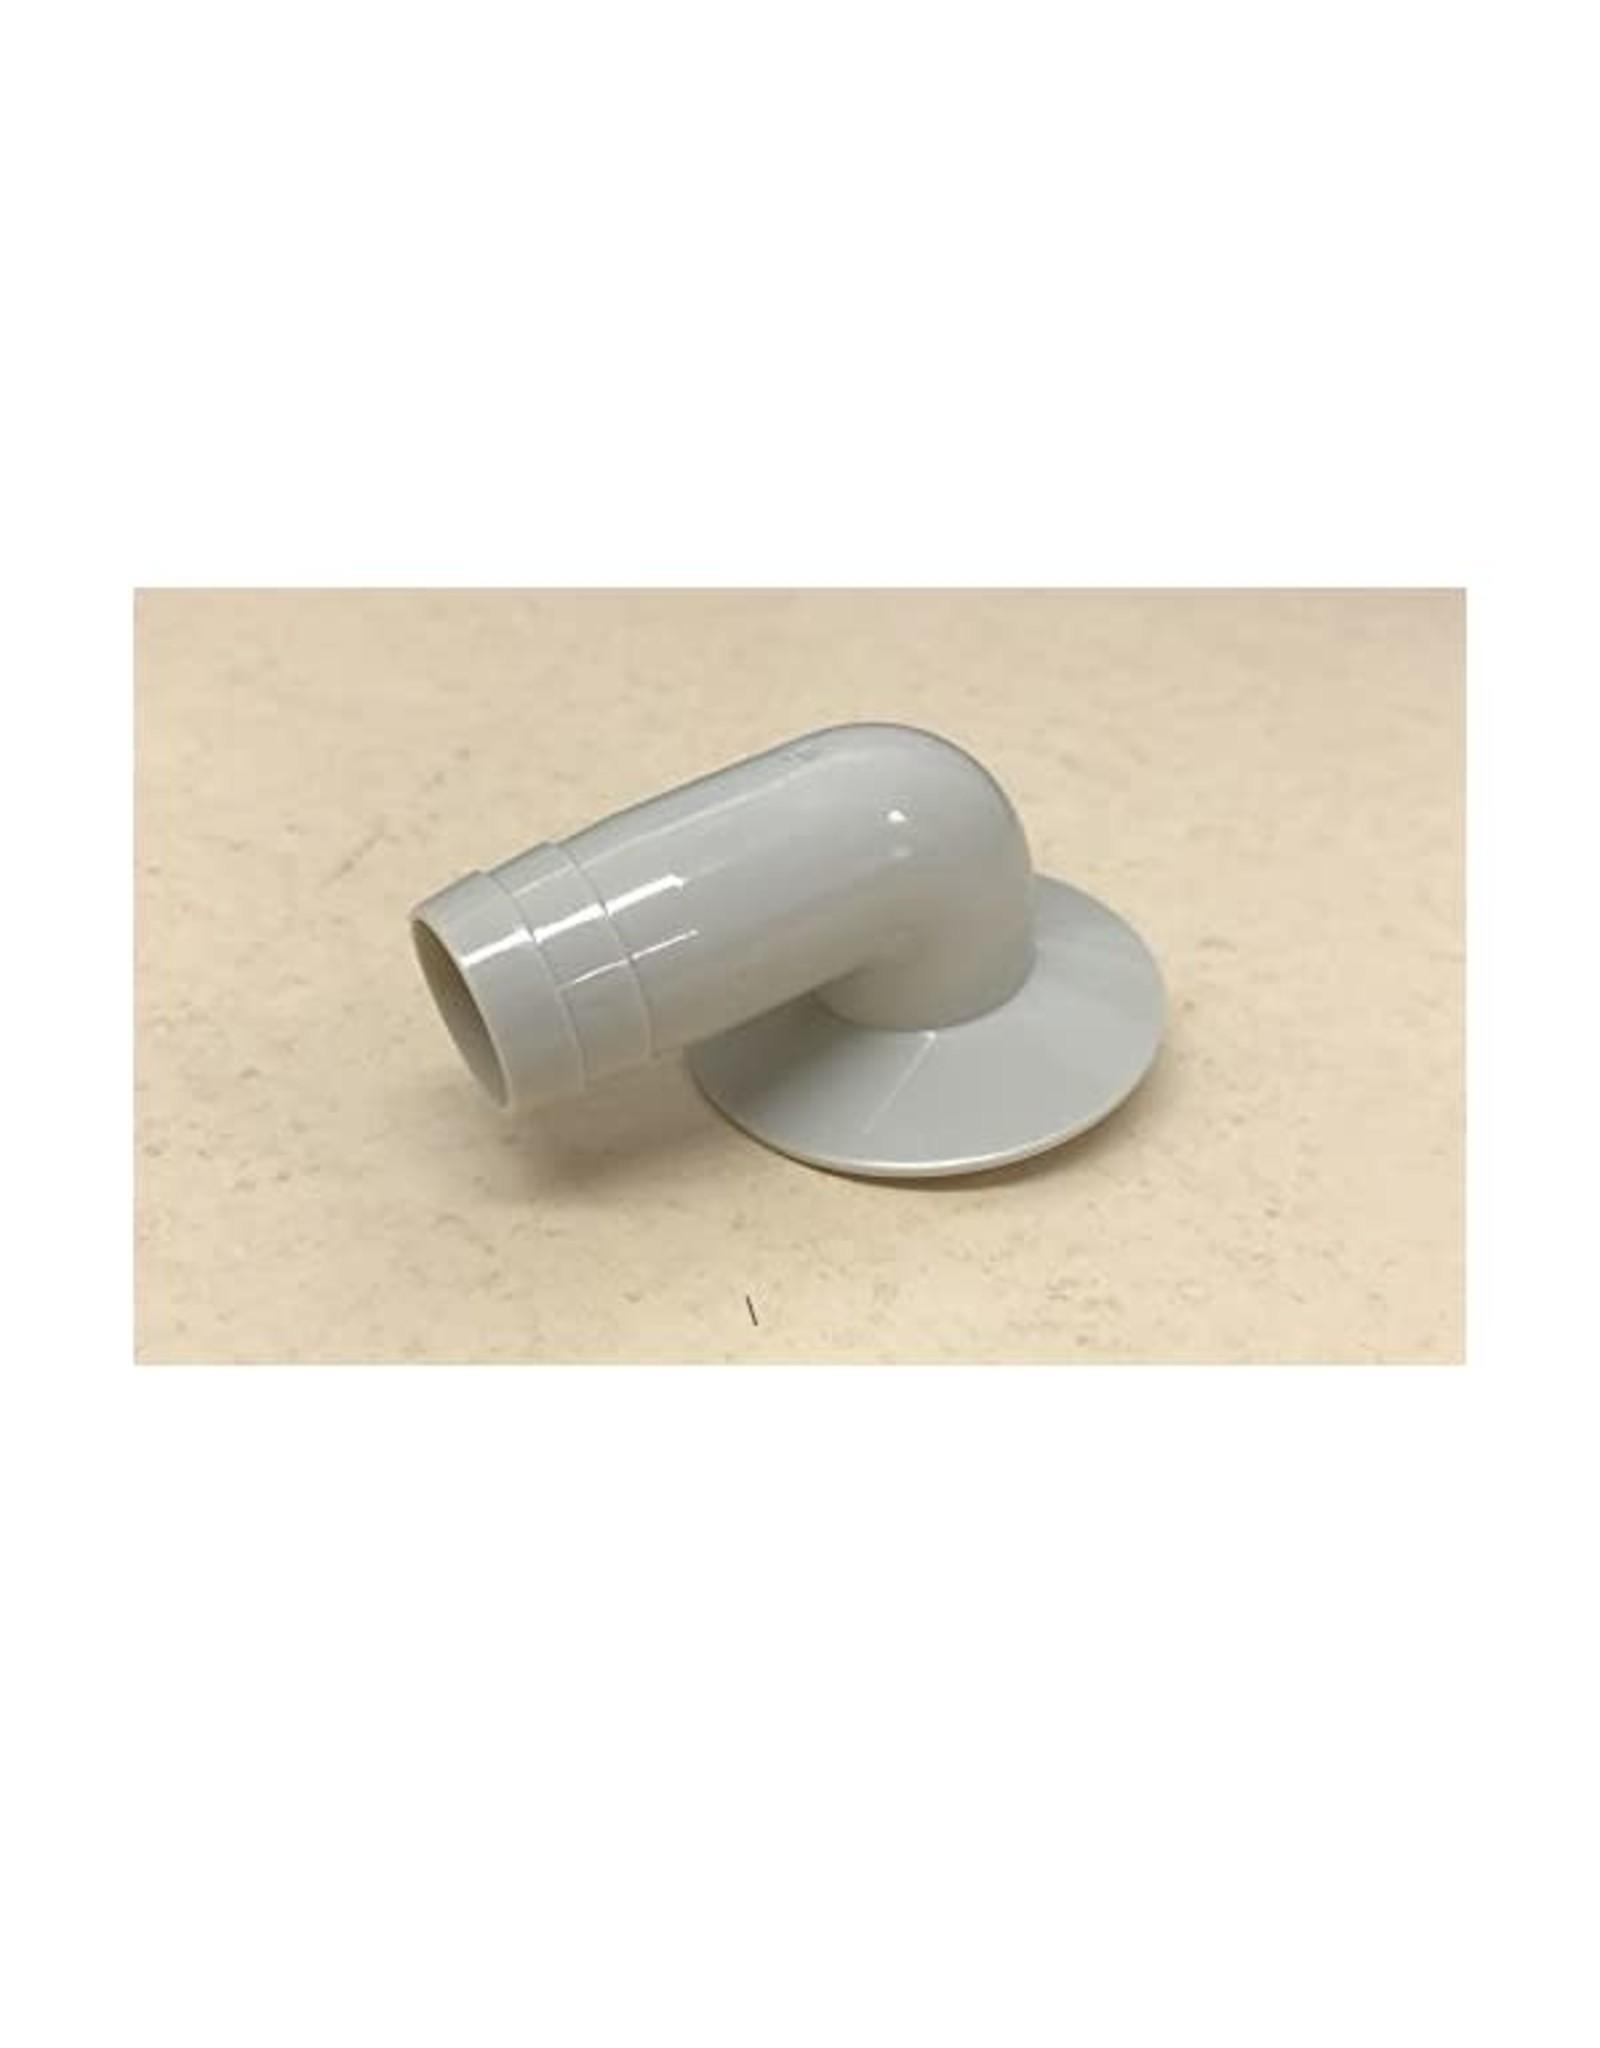 Daikin Applied Americas Drain Plug for Condenser Units